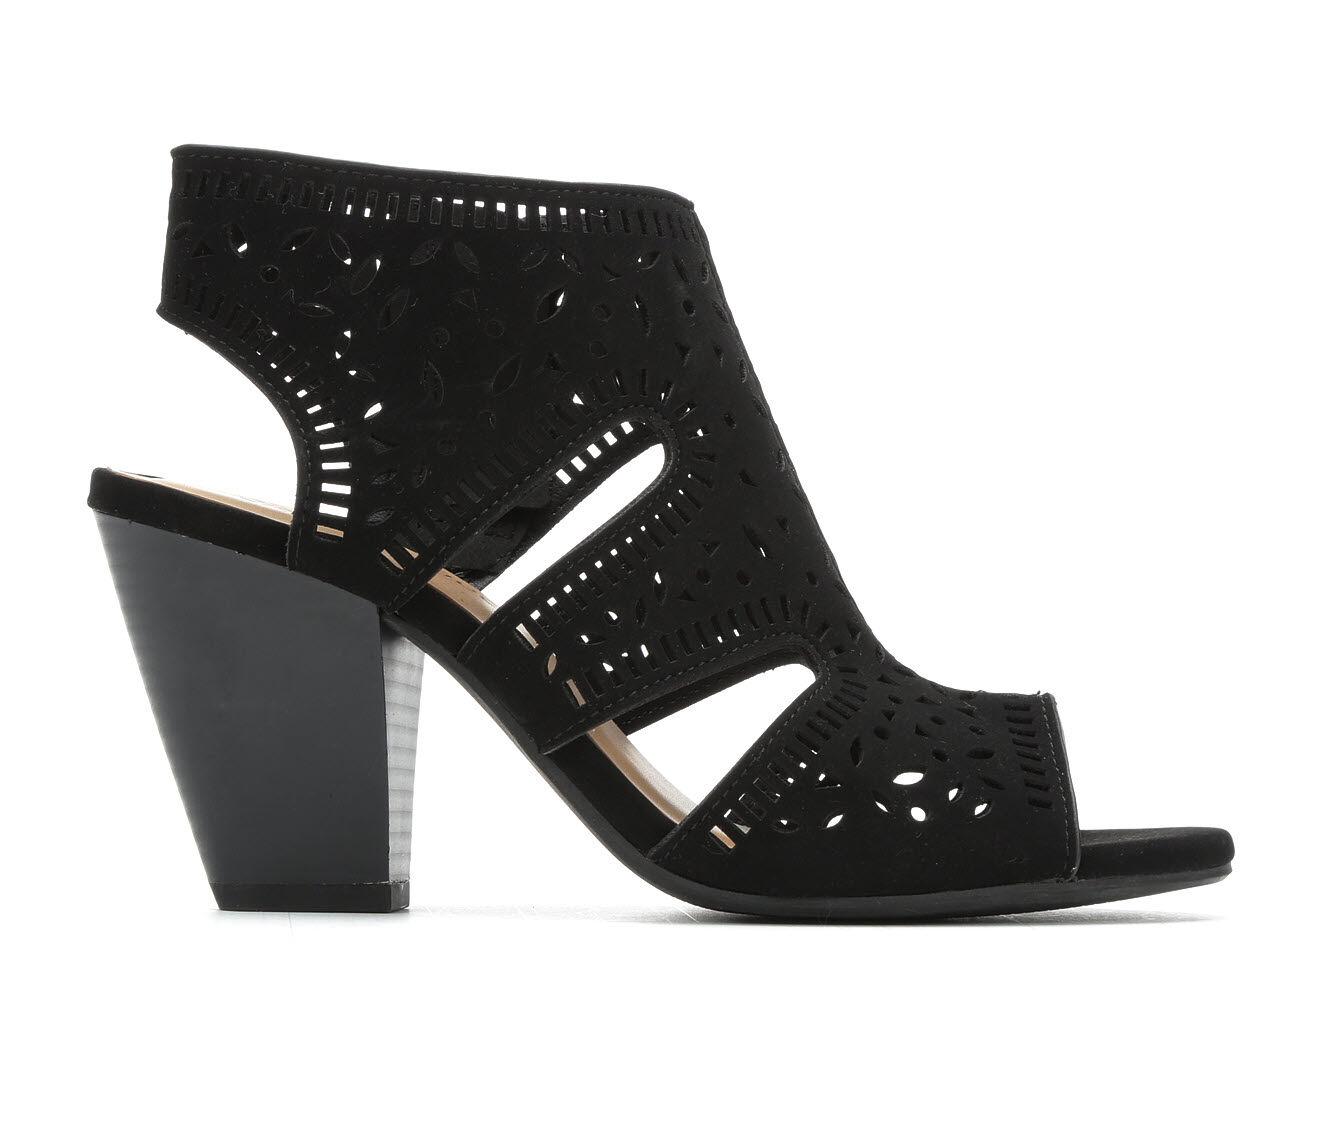 Women's City Classified Spoil Heeled Sandals Black Nub